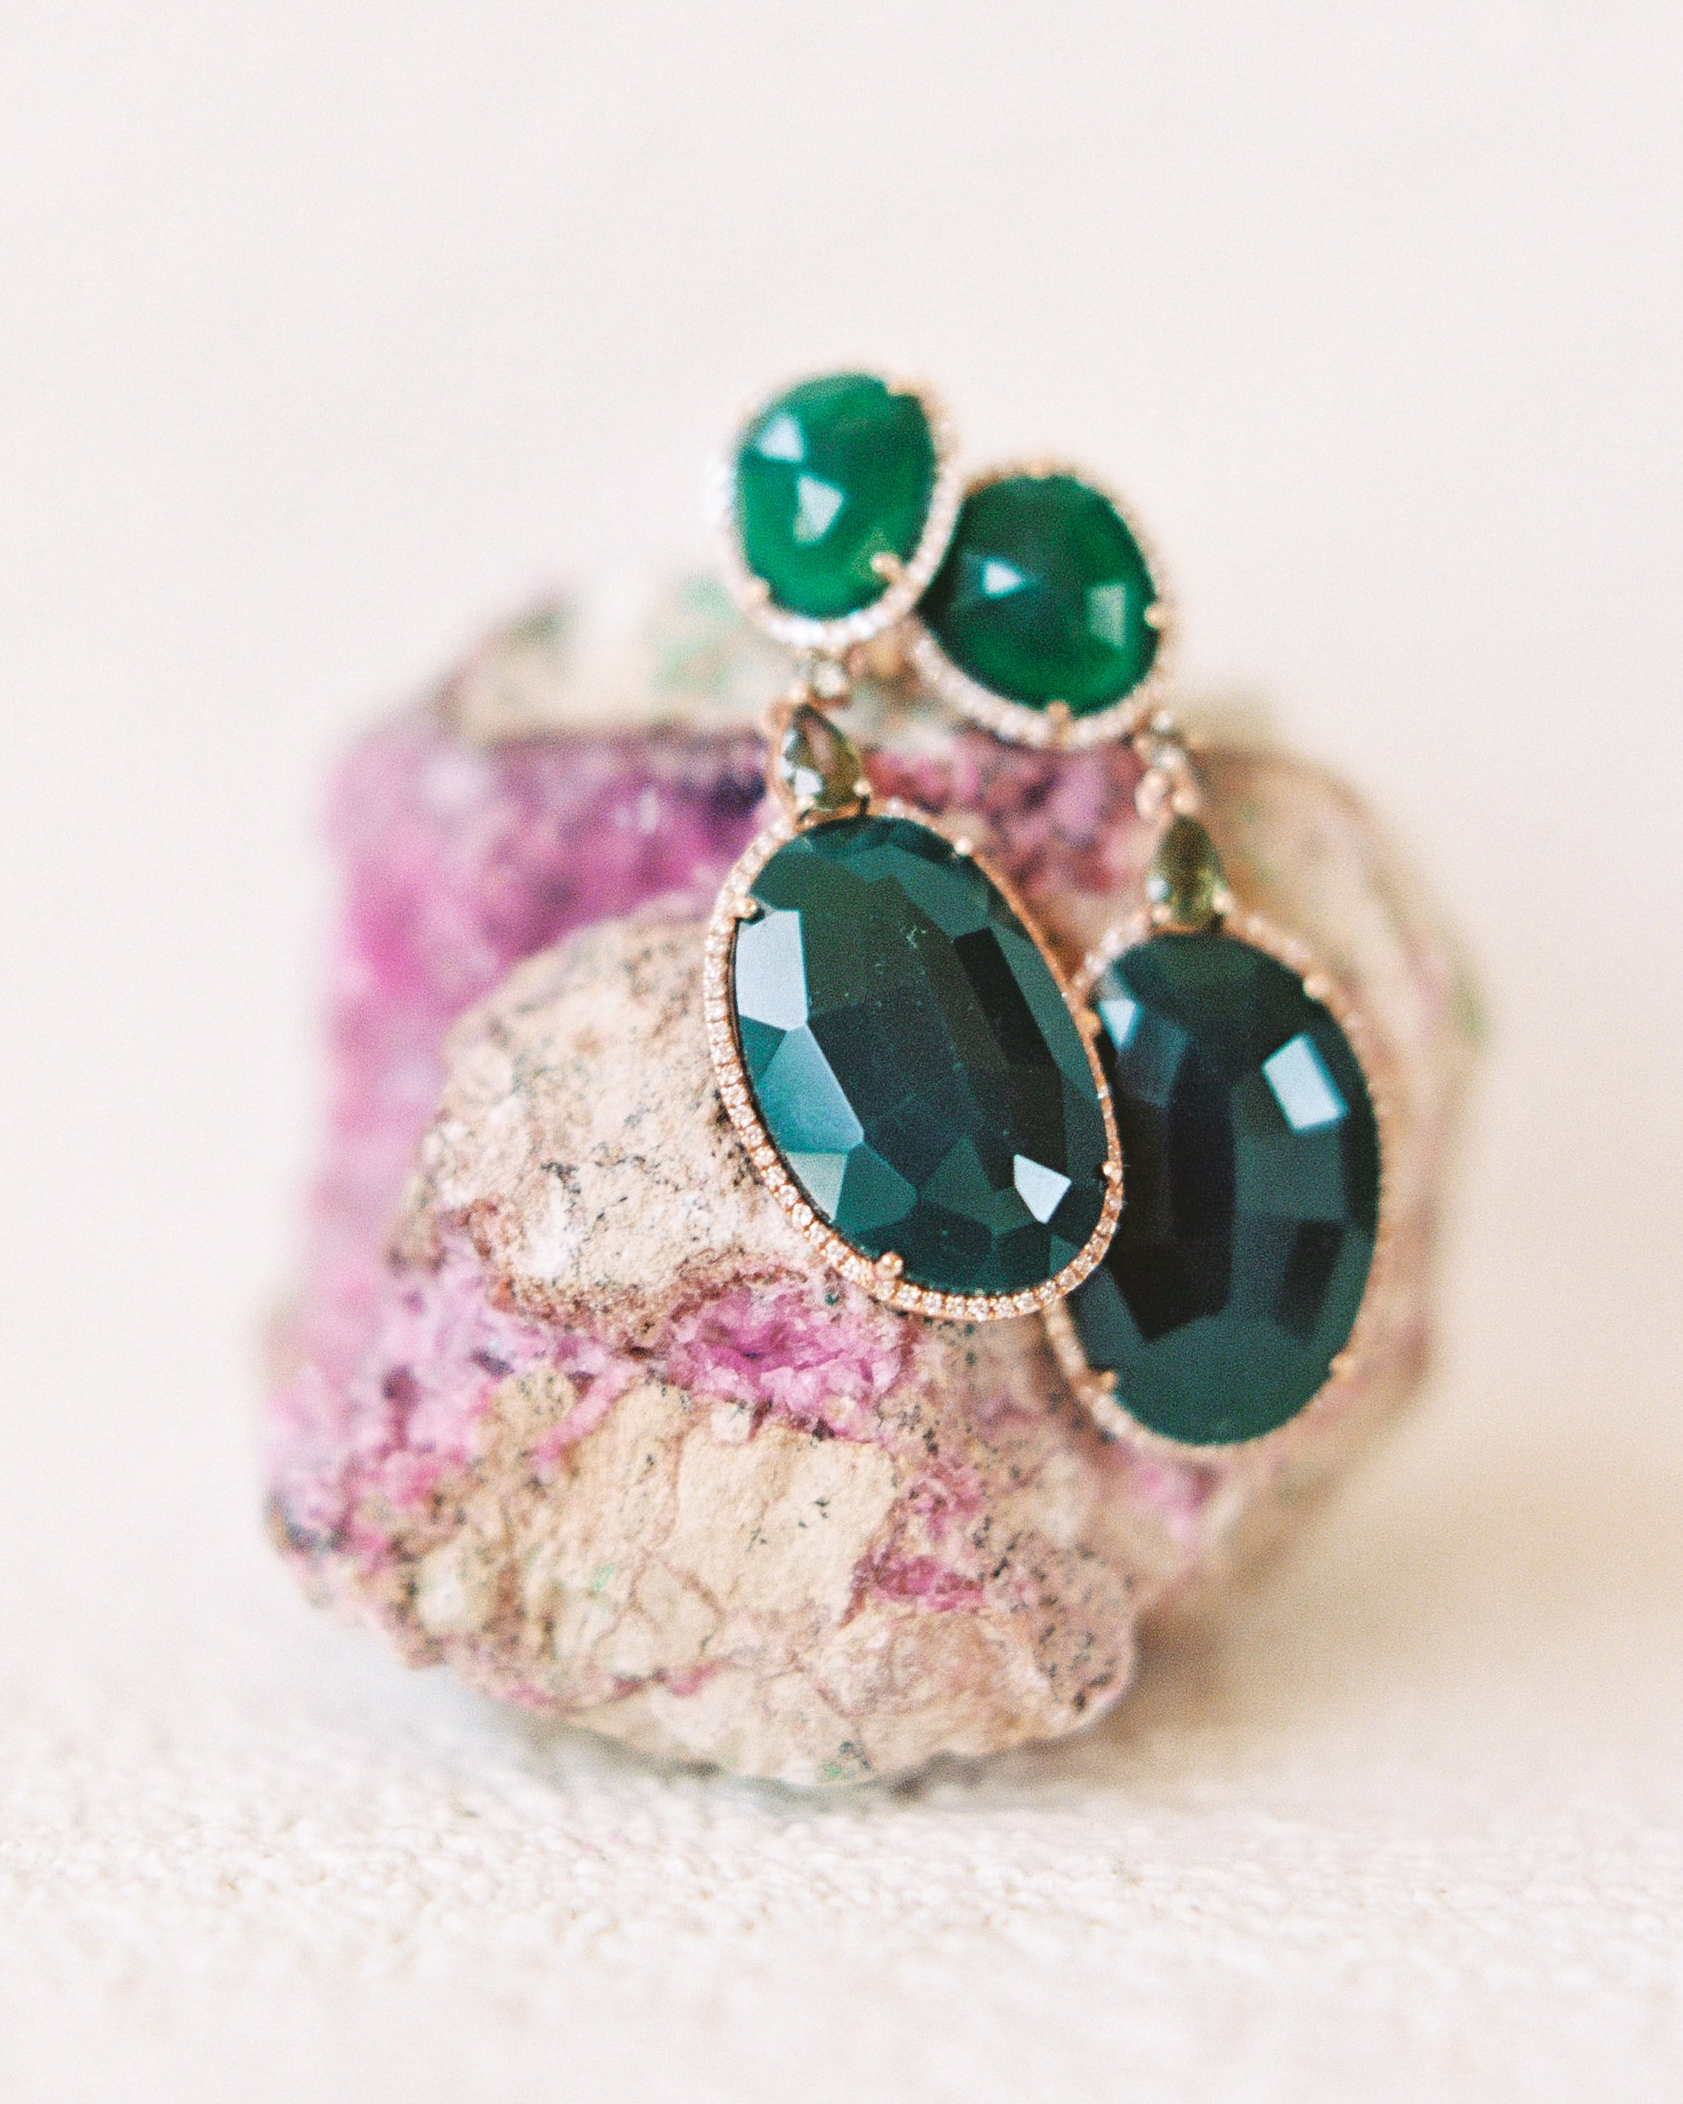 lara-chad-wedding-earrings-013-s112306-1115.jpg